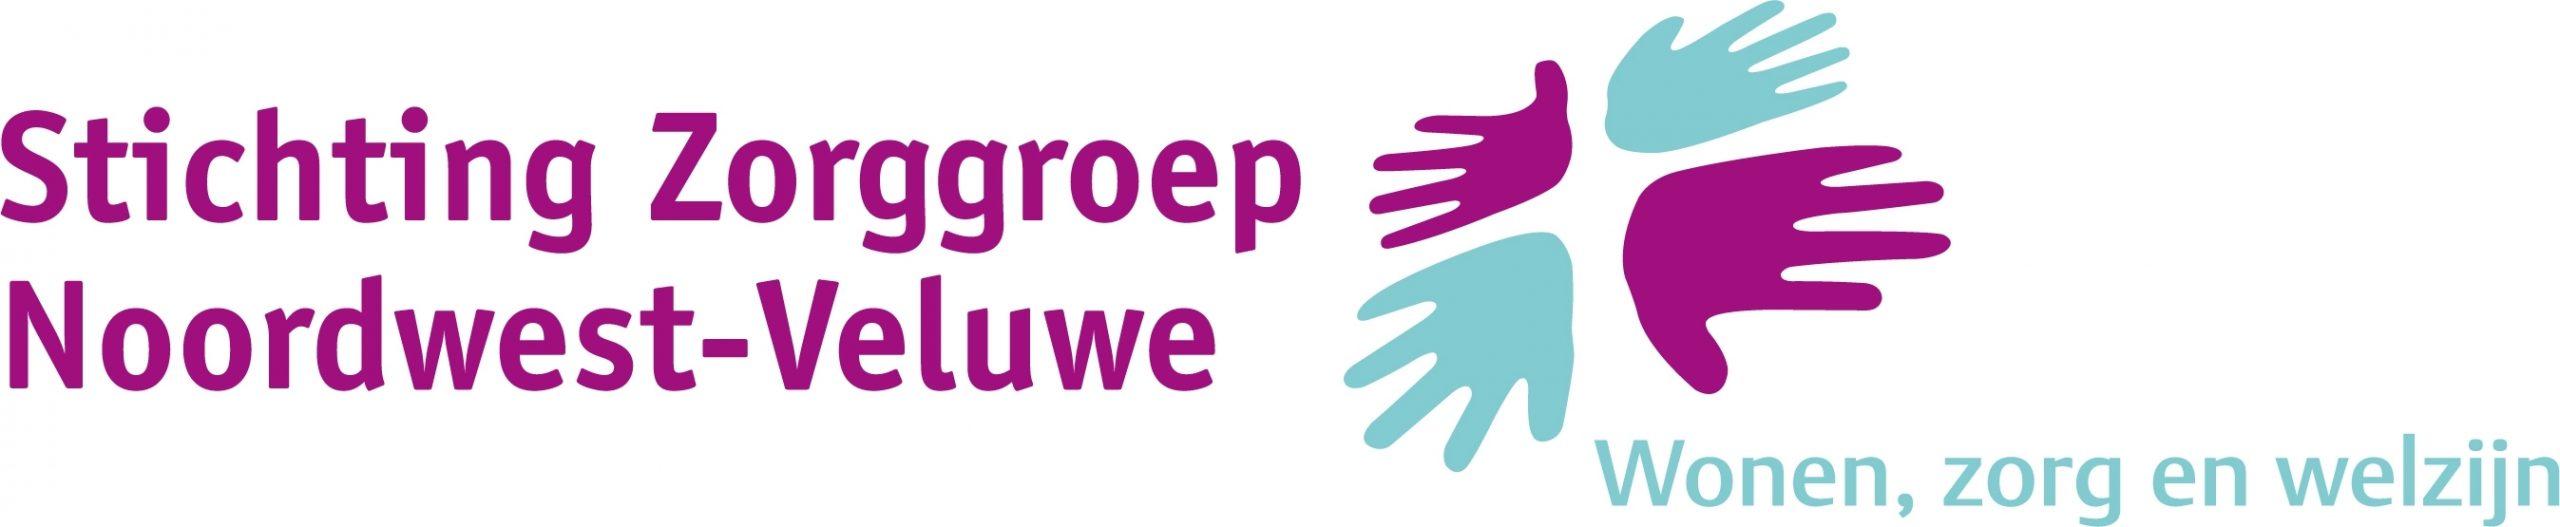 Zorggroep Noordwest Veluwe